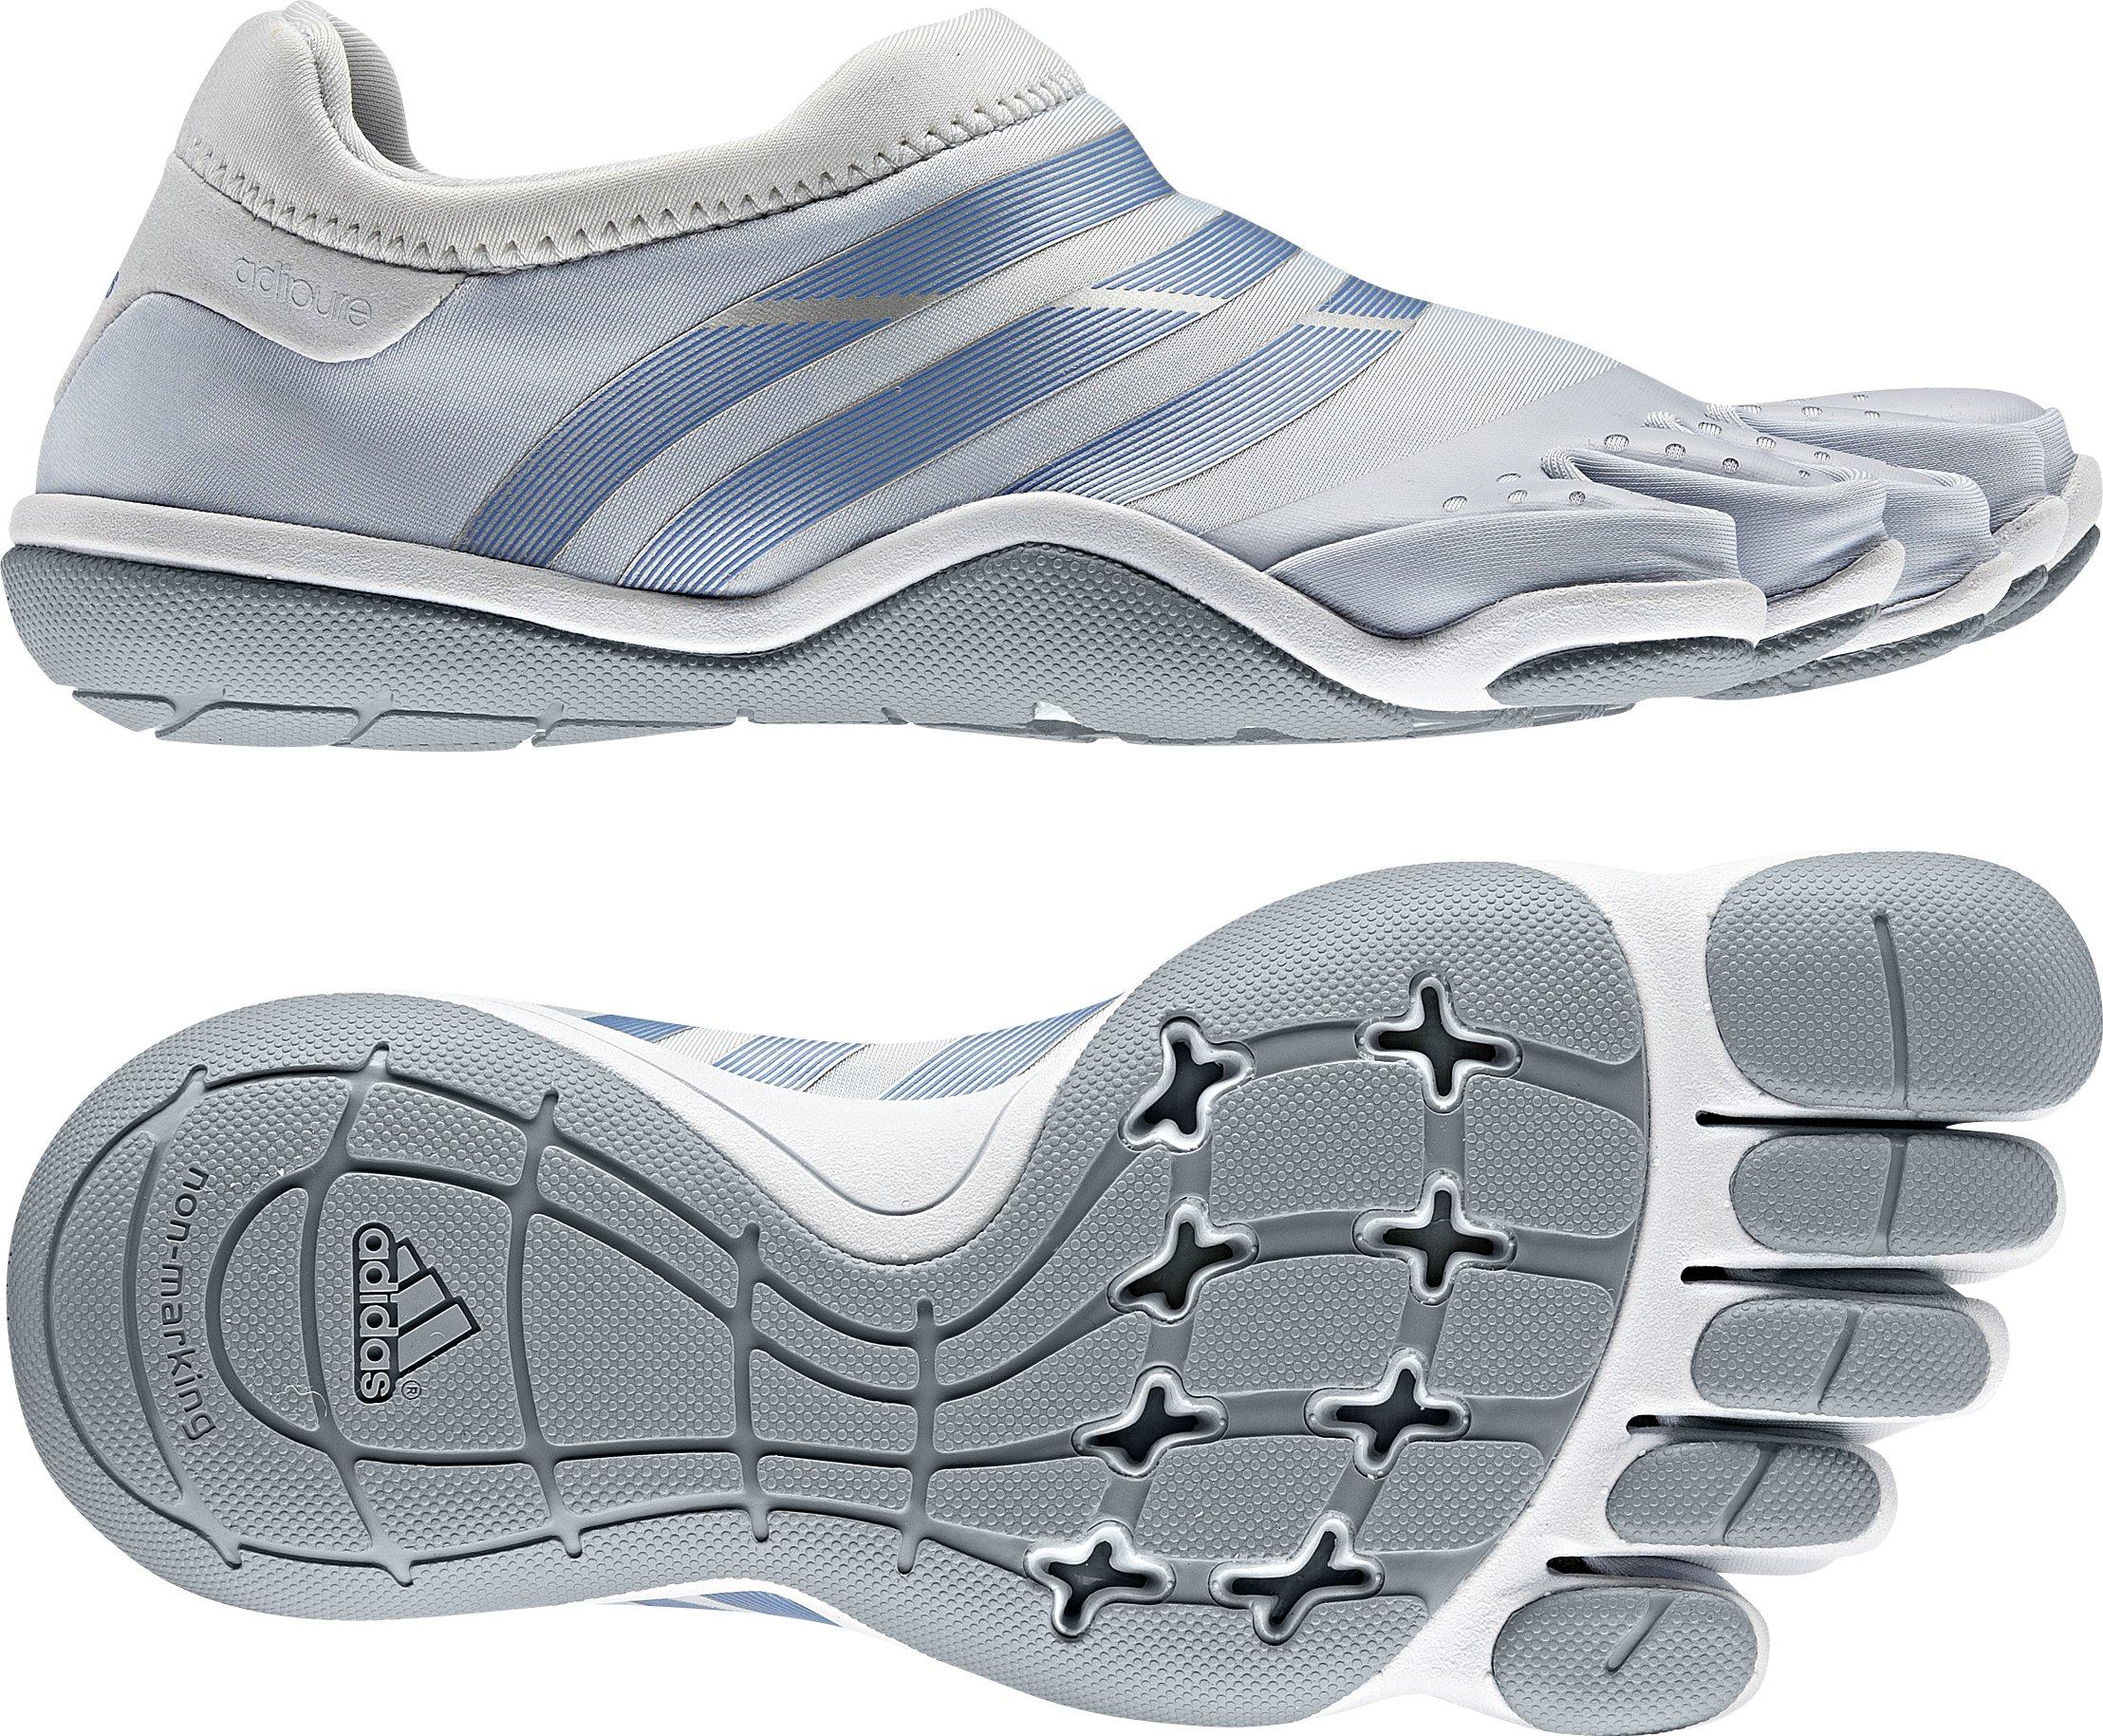 Adidas Oedcbx Doigt Pied A Orteil De Chaussure 9YIWDH2E